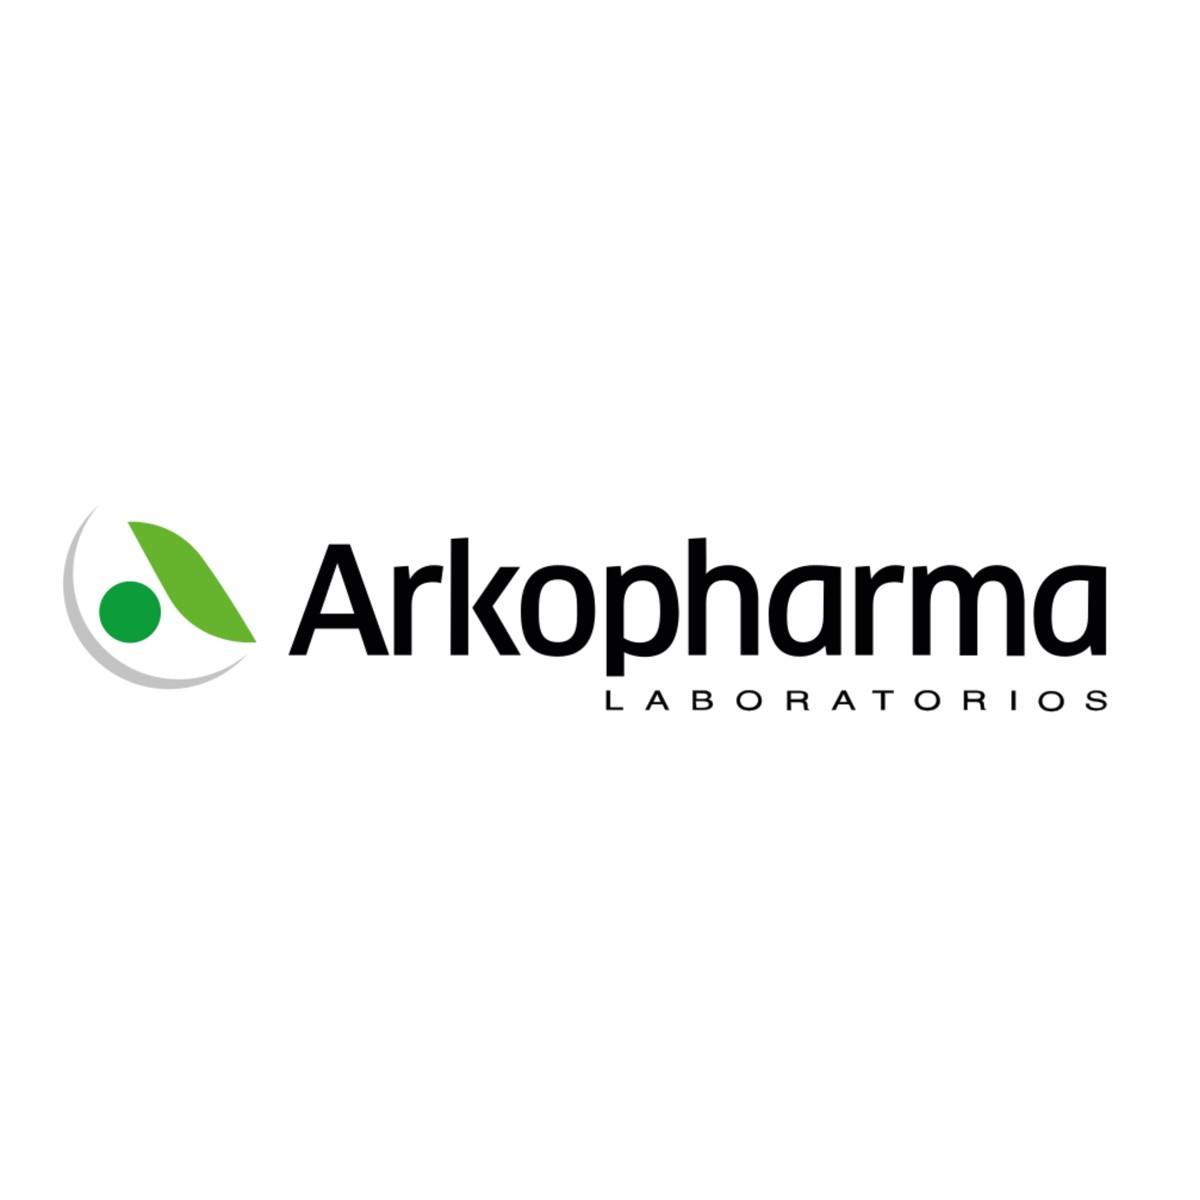 Arkopharma